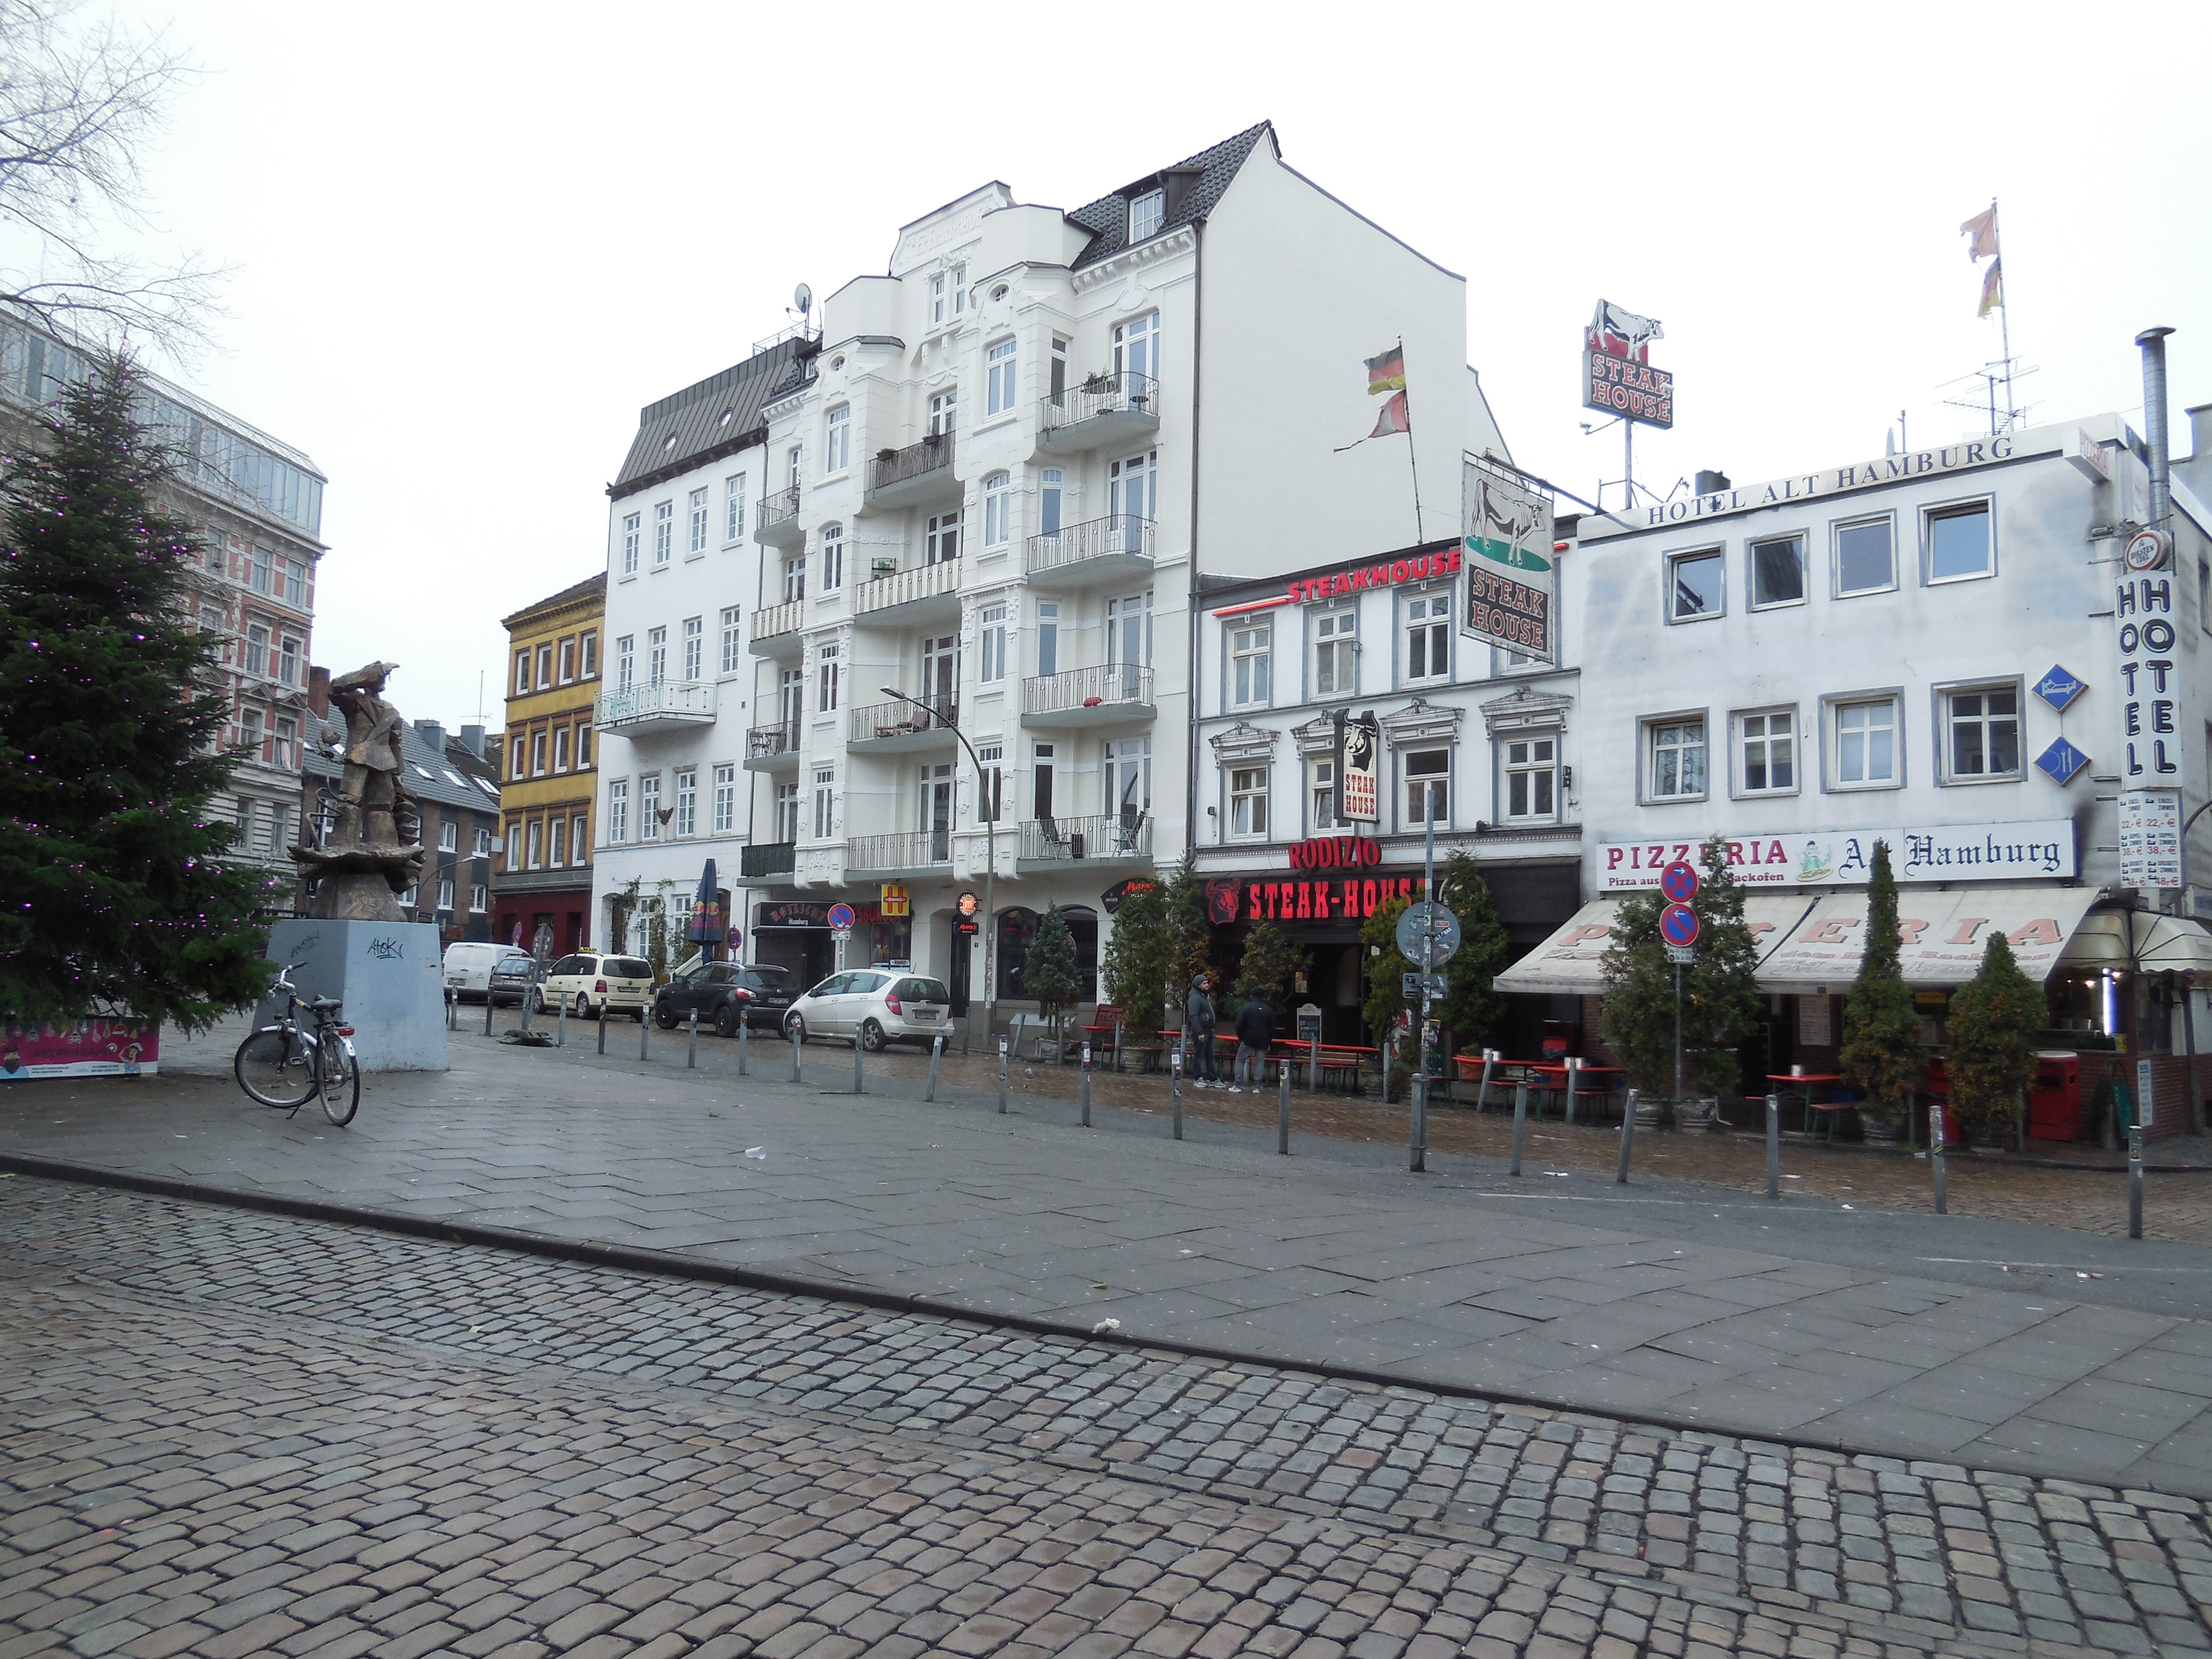 Hans Albers Platz Hamburg